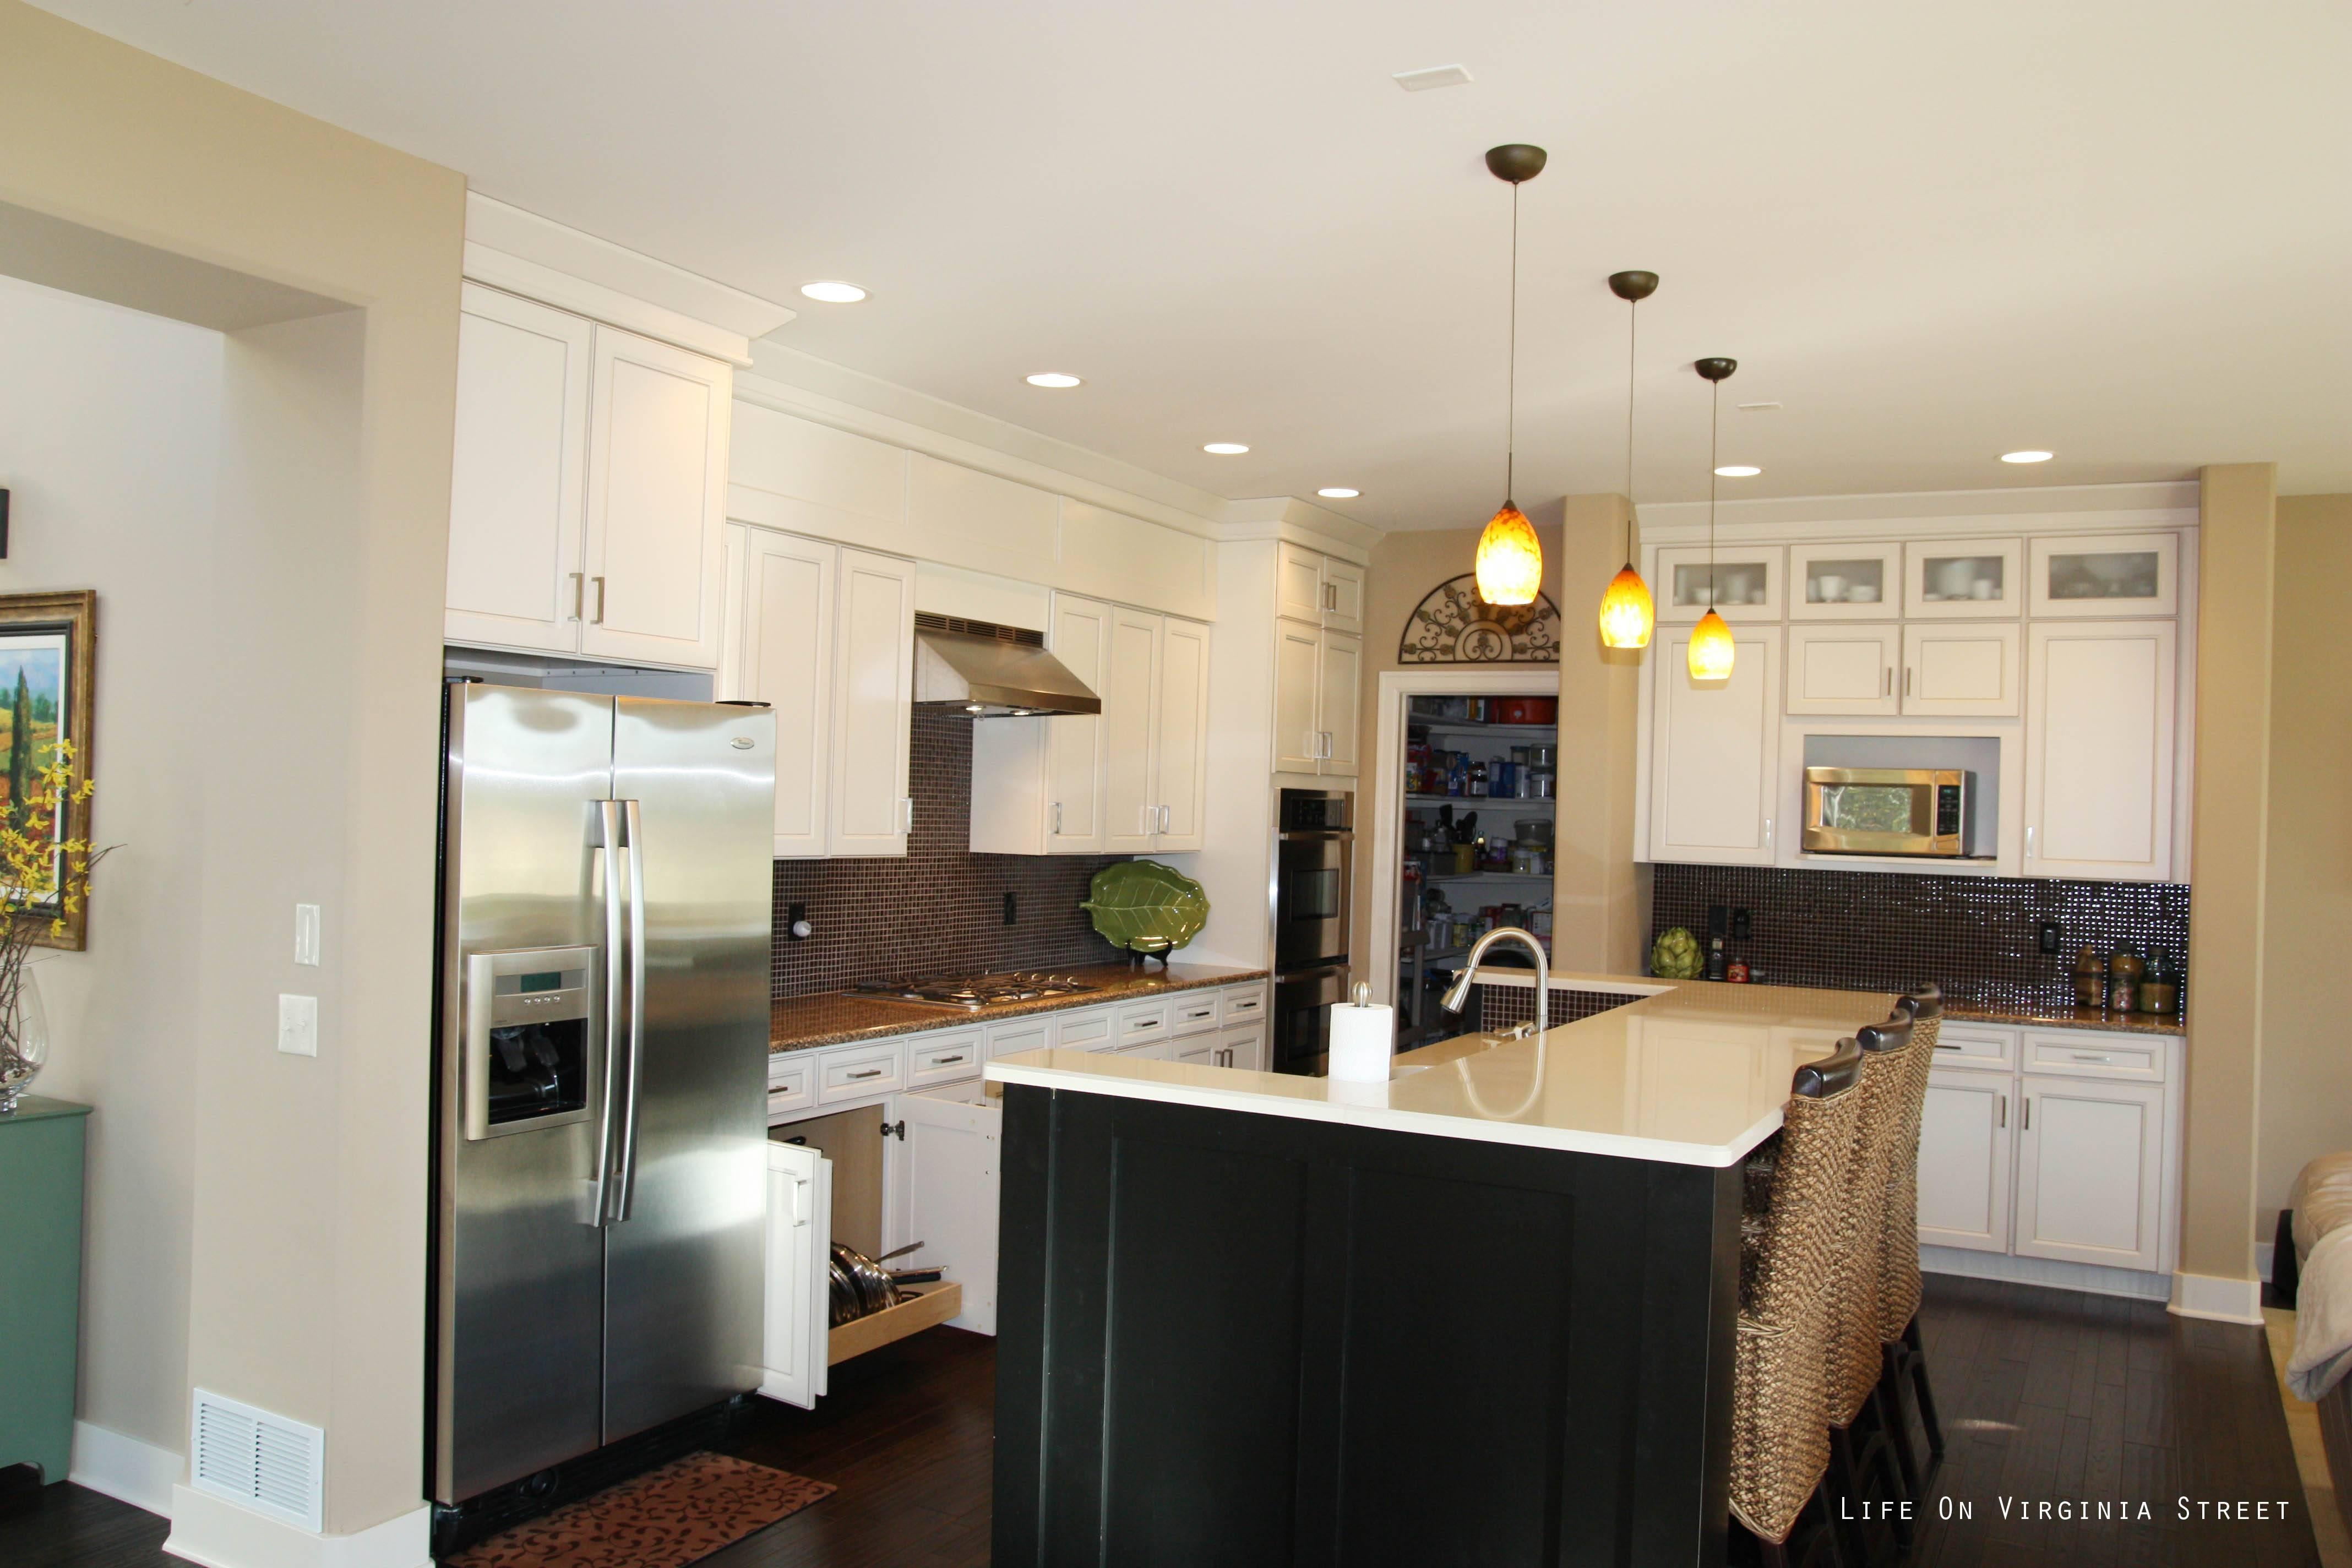 Amazing Of Mini Pendant Lights Over Kitchen Island On House Decor For Kitchen Island Single Pendant Lighting (View 6 of 15)